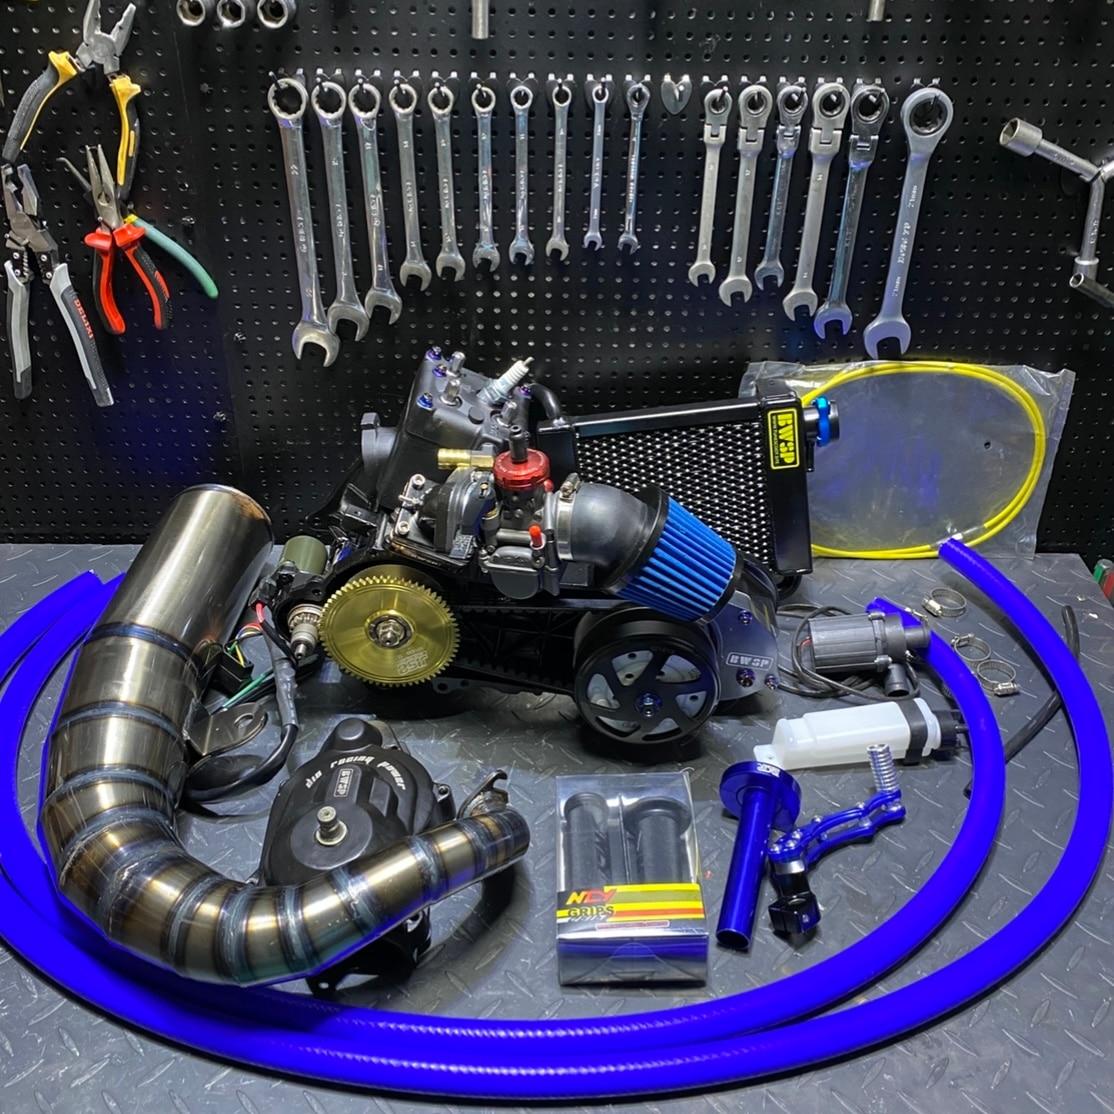 DIO50 AF18 125cc Engine By BWSP 54mm Cylinder Long Stroke Crankshaft 52.6mm Rotor 92mm Variator JISO Clutch Exhaust Radiator